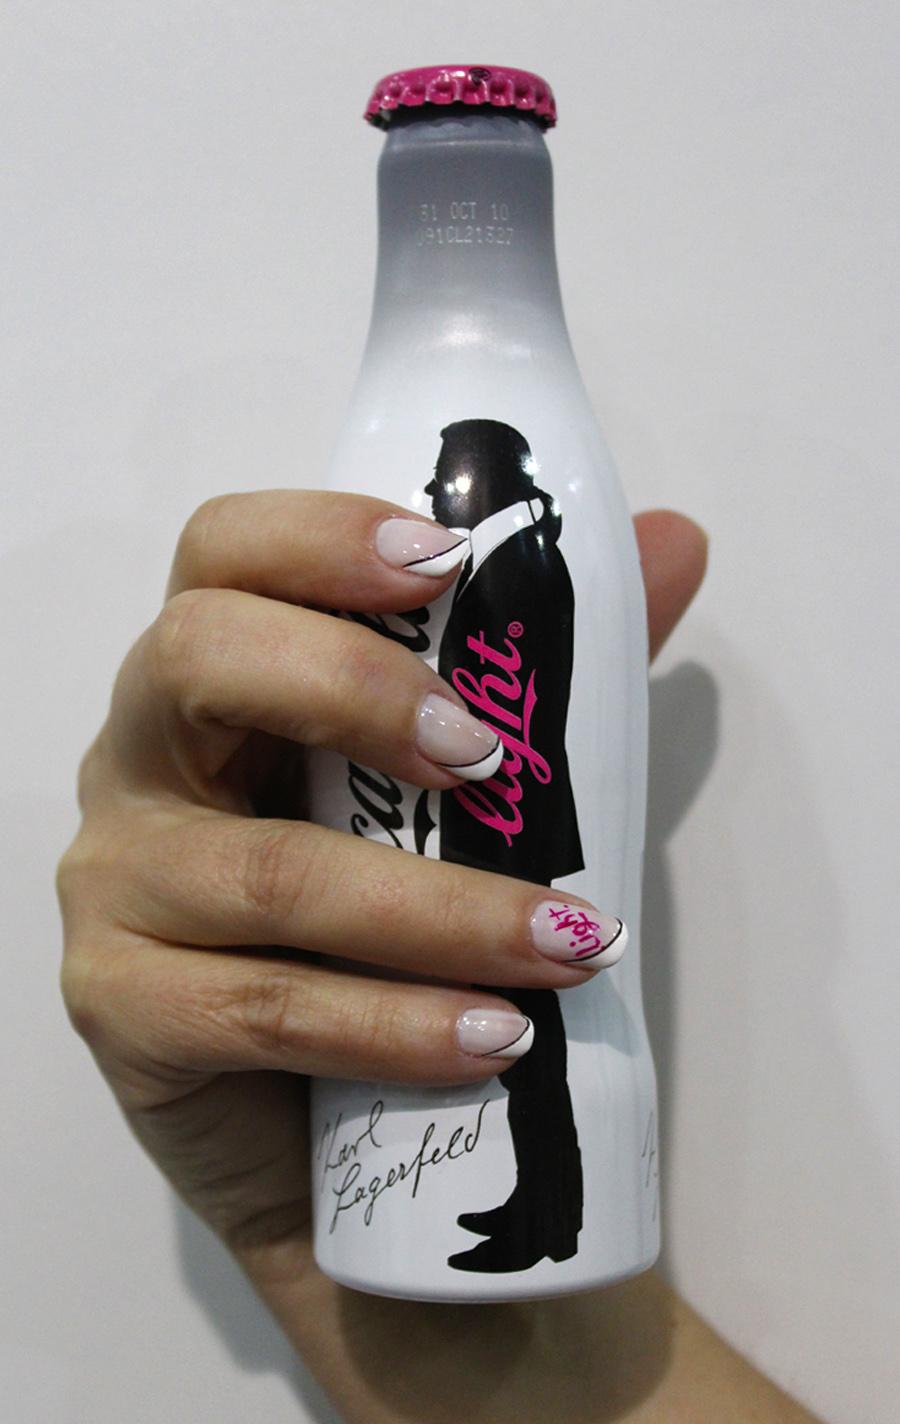 stroke-nails-art-bodegon-coca-cola-karl-lagerfeld